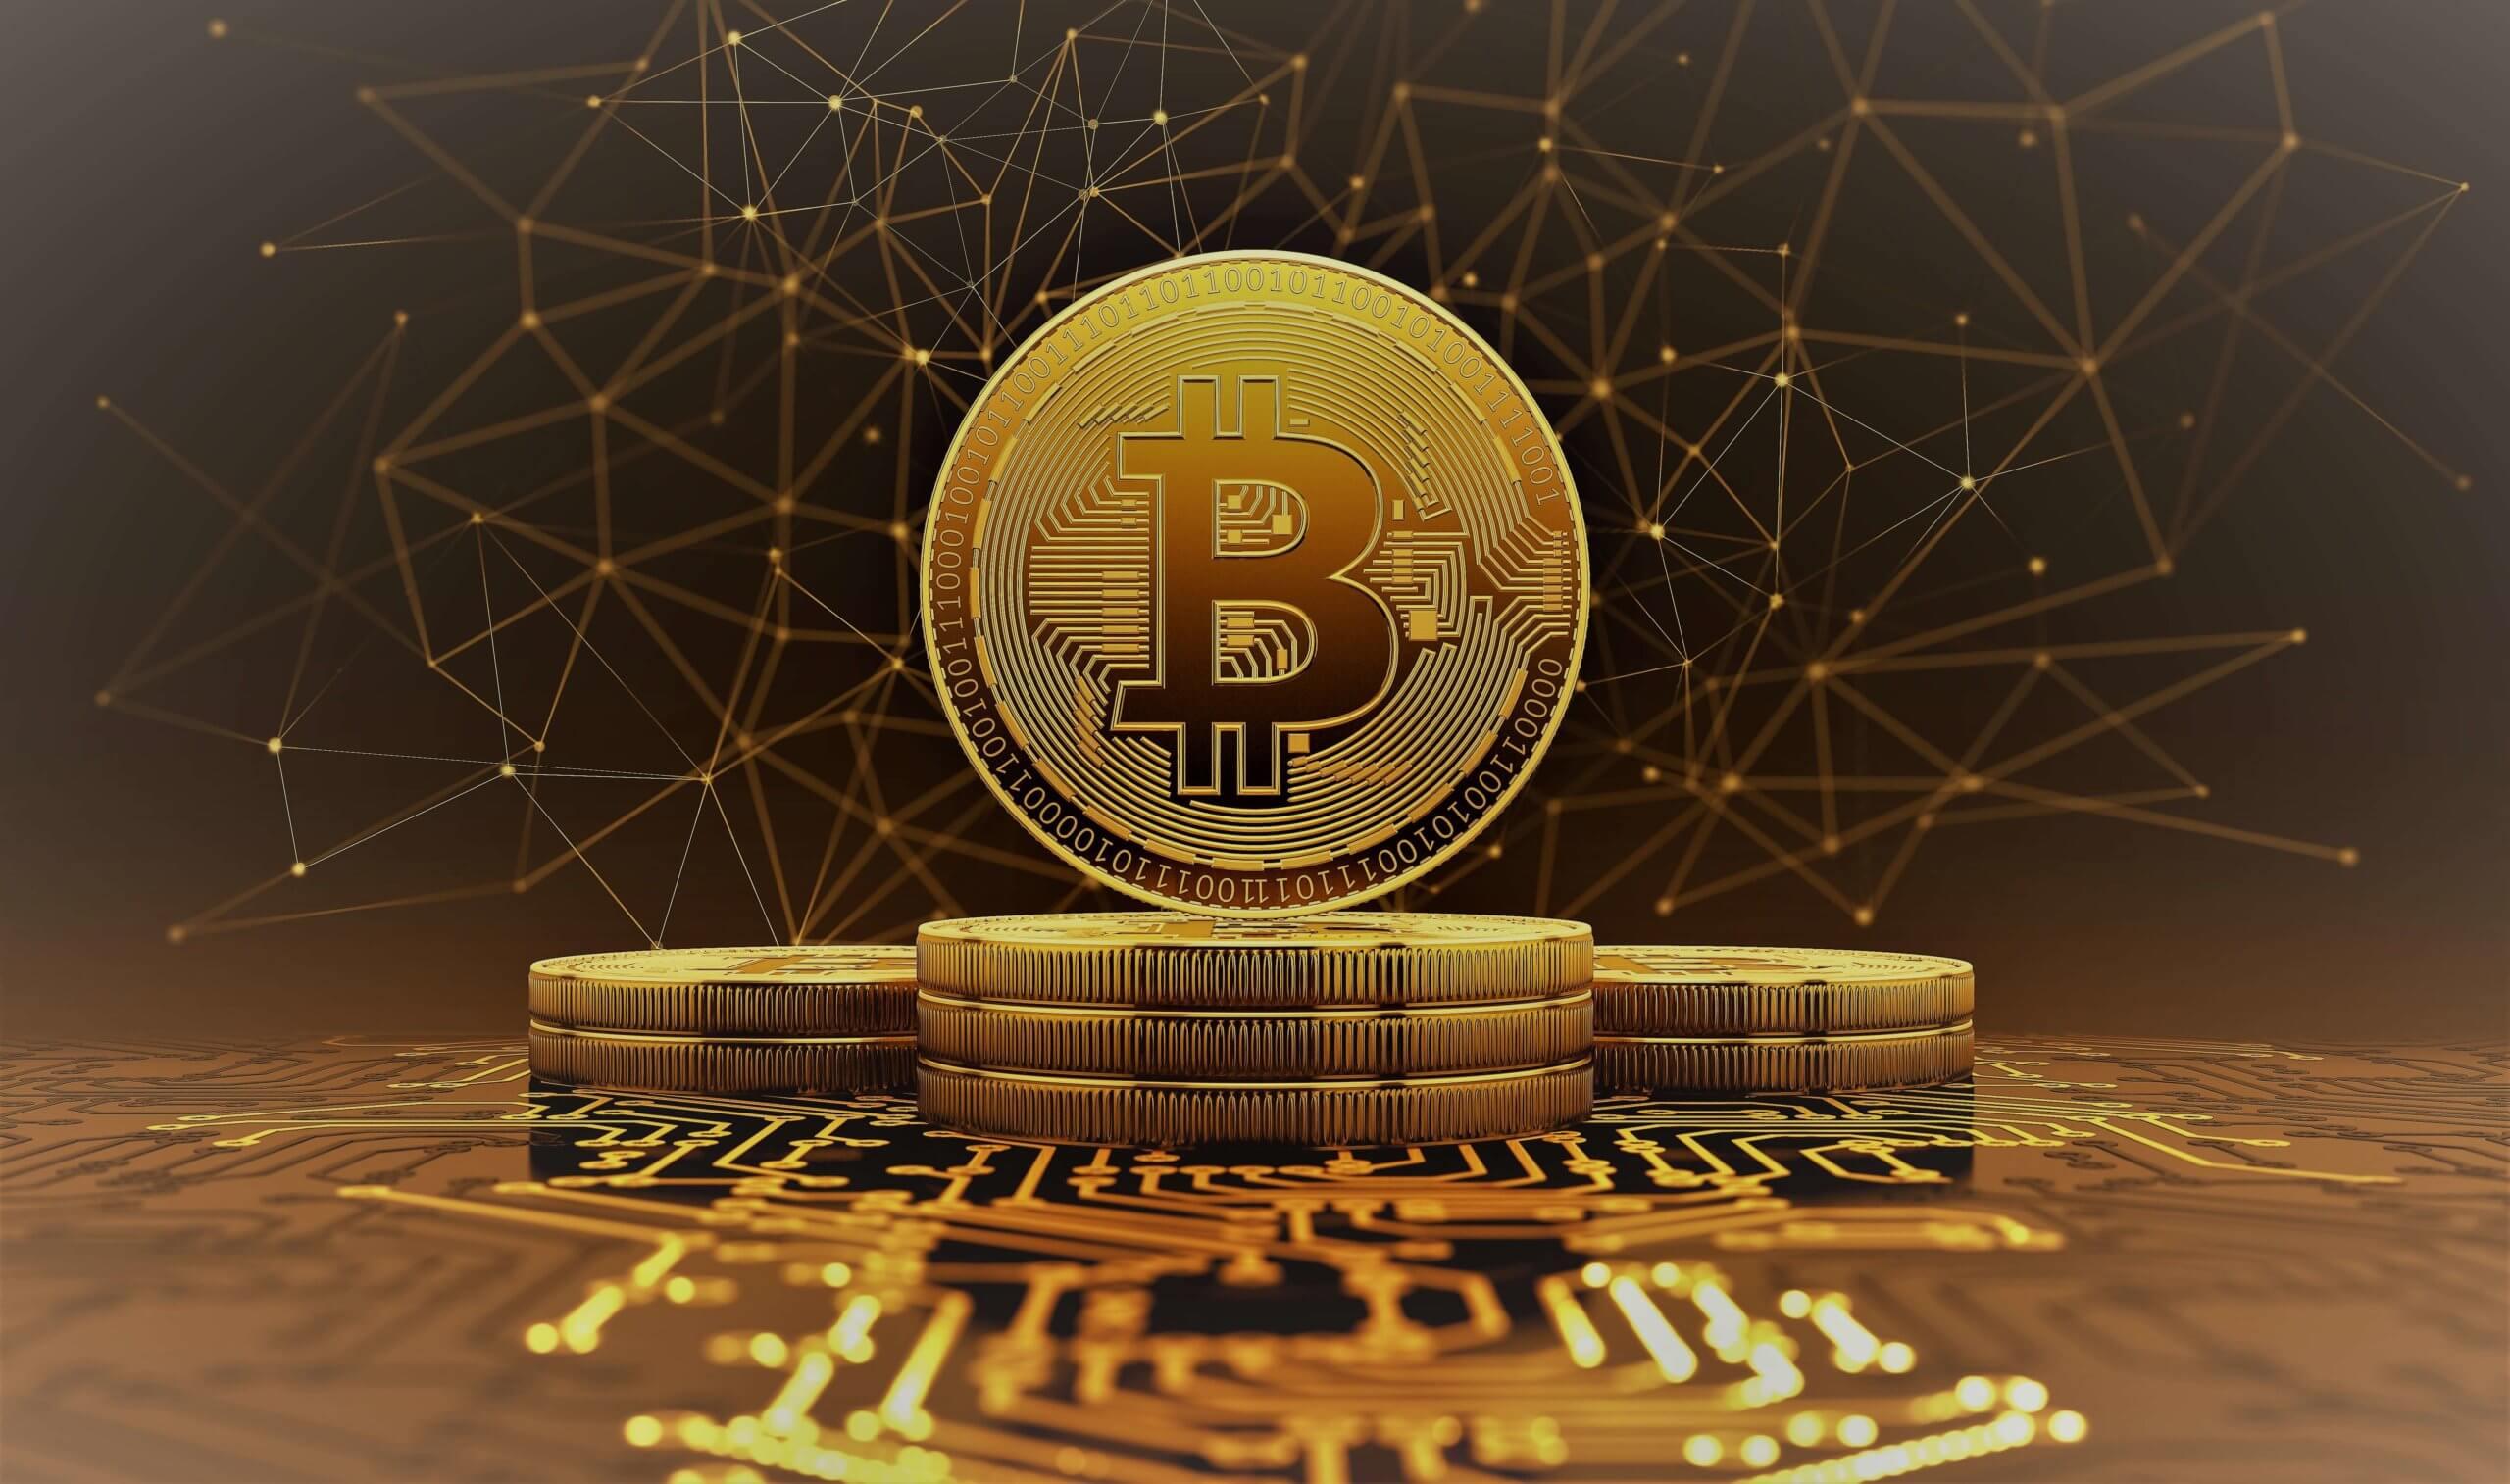 Bitcoin kasinoilla toimii maksutapana myös Bitcoin